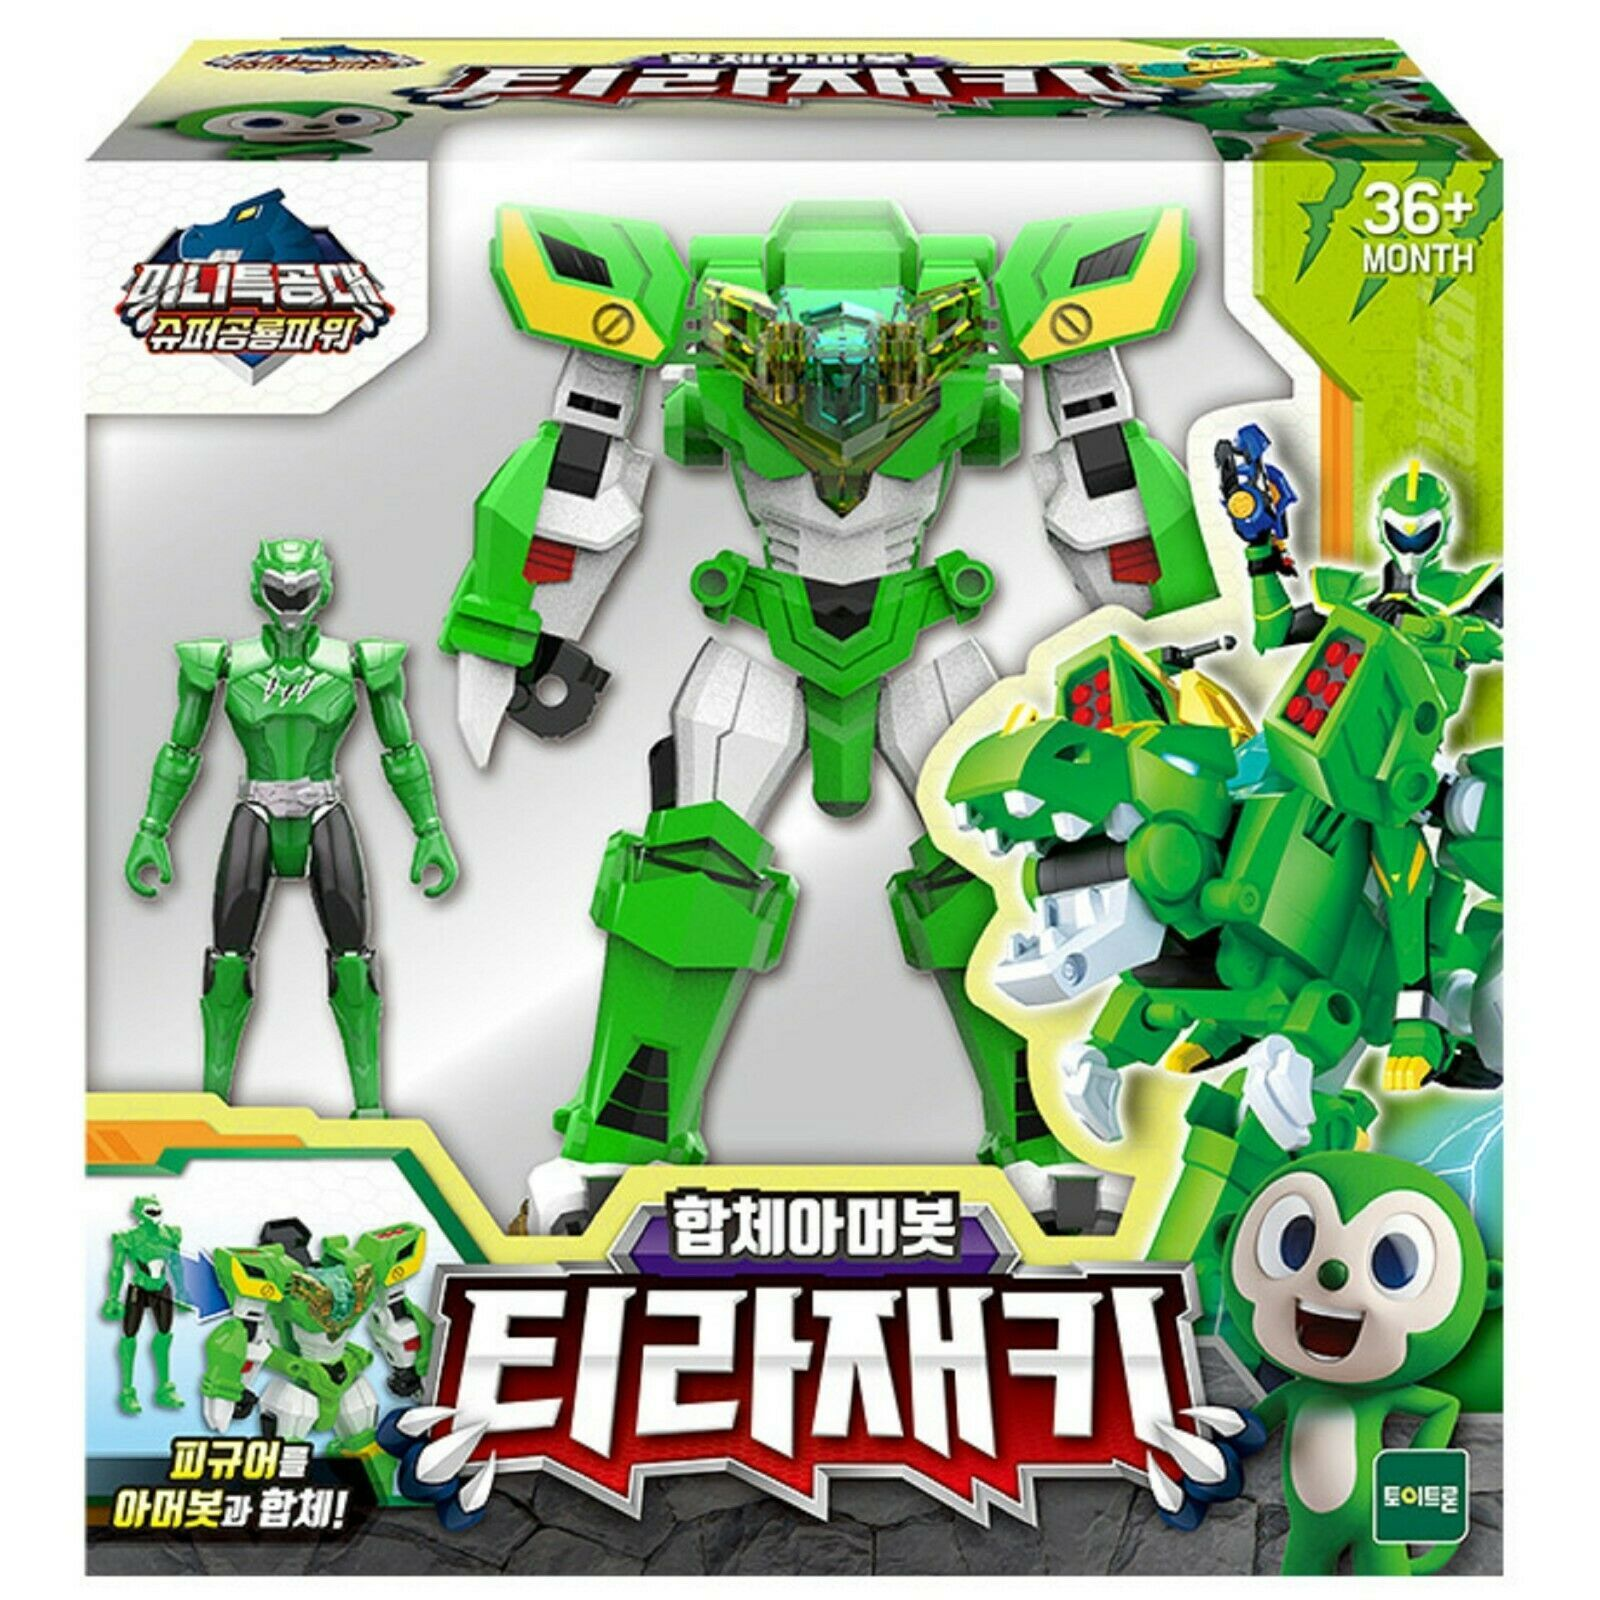 Miniforce Tyra Jackie Transformation Action Figure Super Dinosaur Power Toy